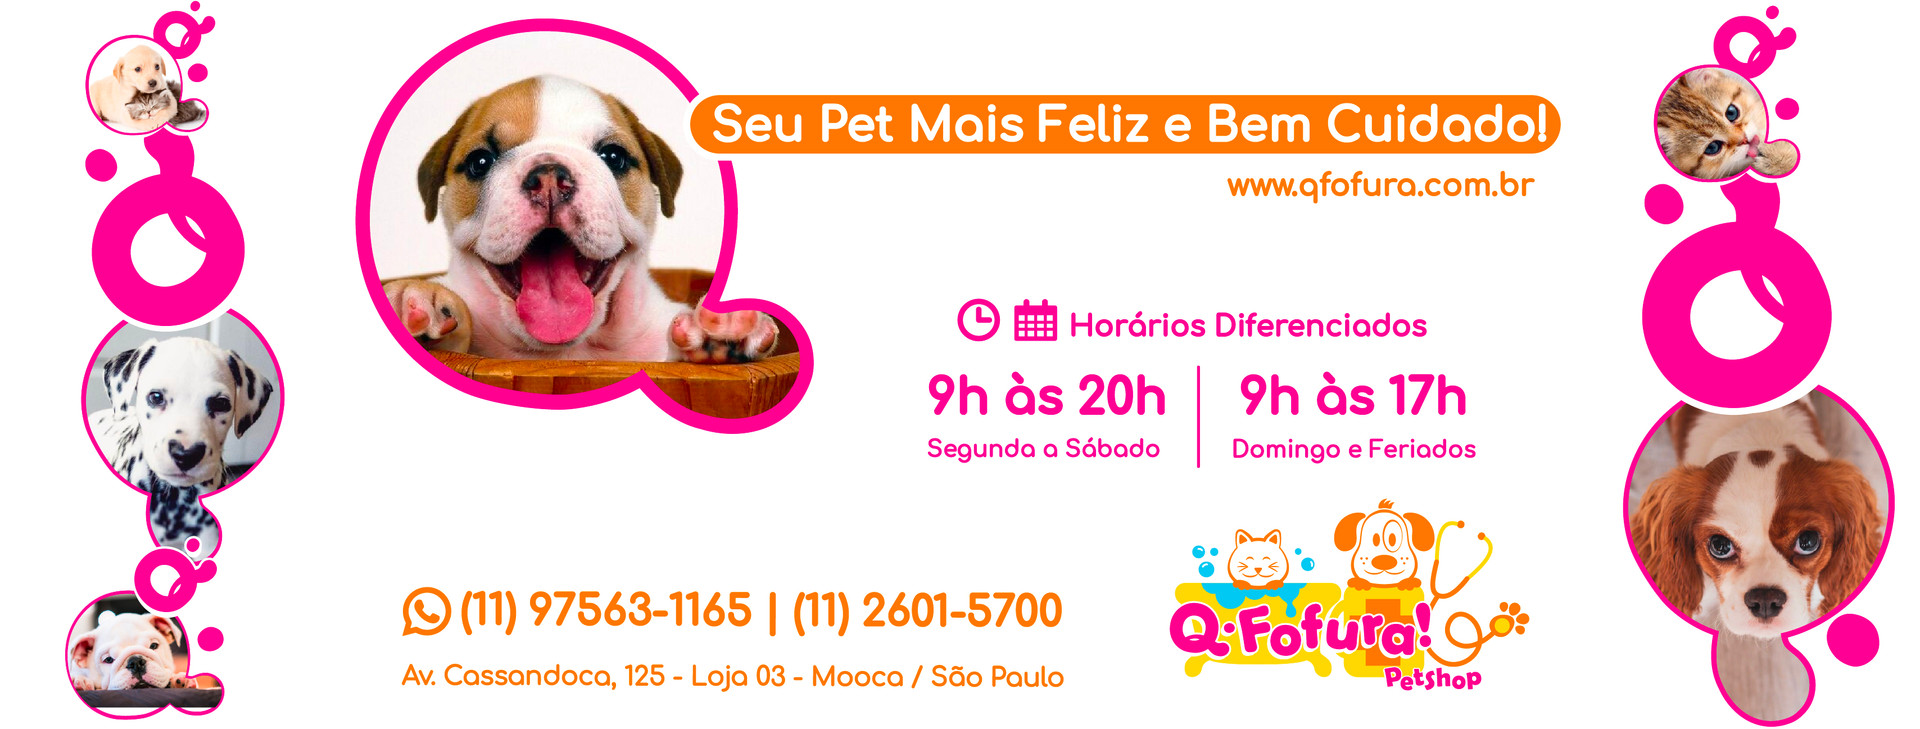 capa-facebook-Qfofura-mooca-blog-01.jpg